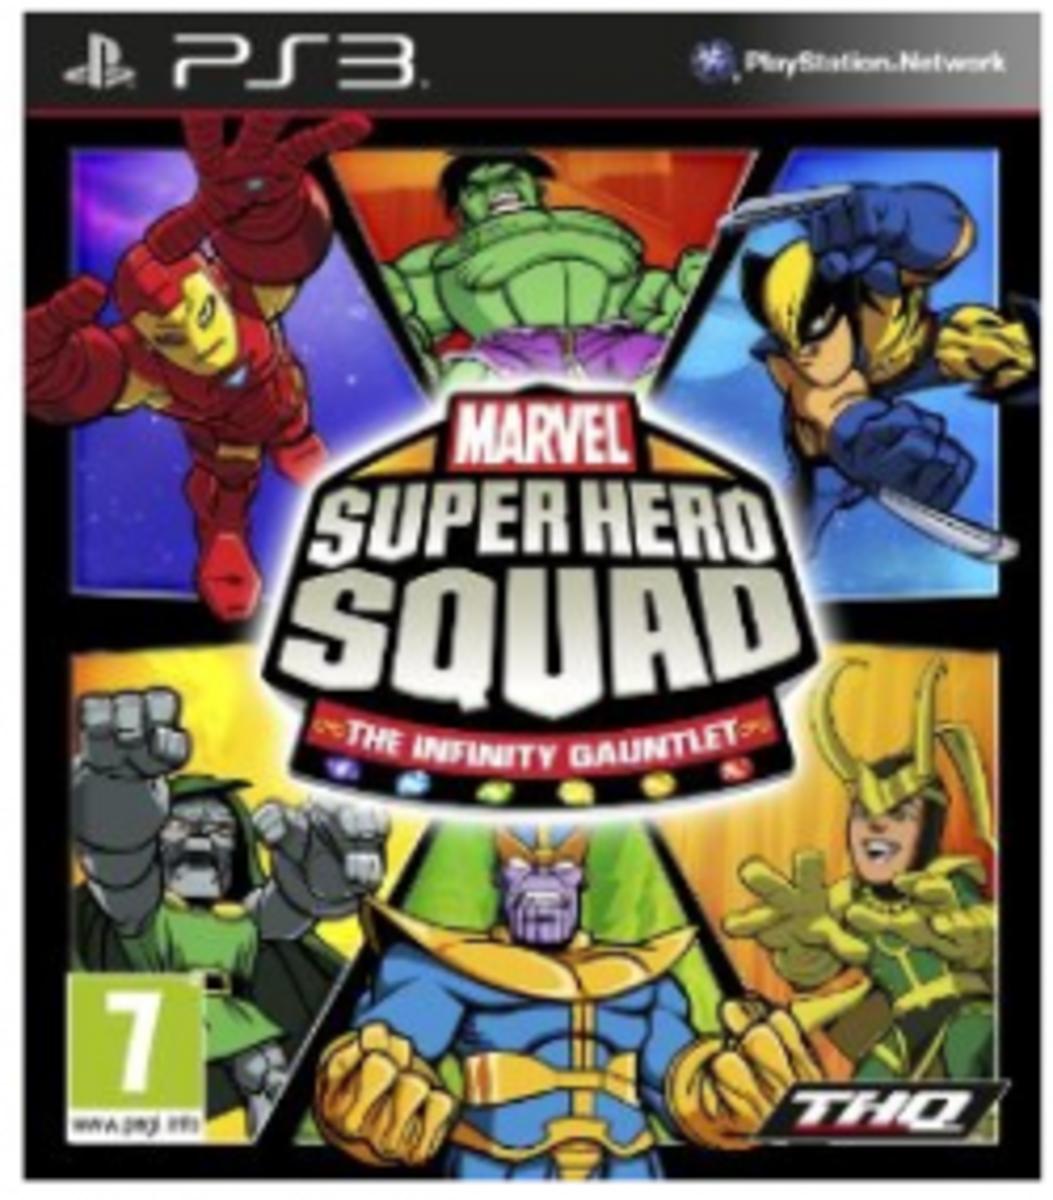 Marvel Super Hero Squad: The Infinity Gauntlet